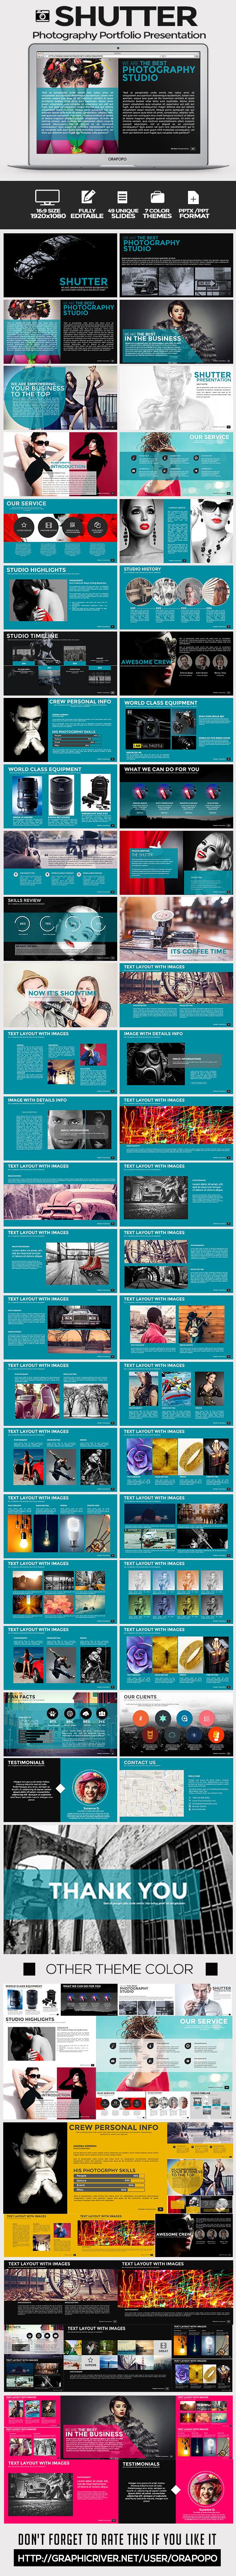 GraphicRiver Shutter Photography Portfolio Presentation 9174831